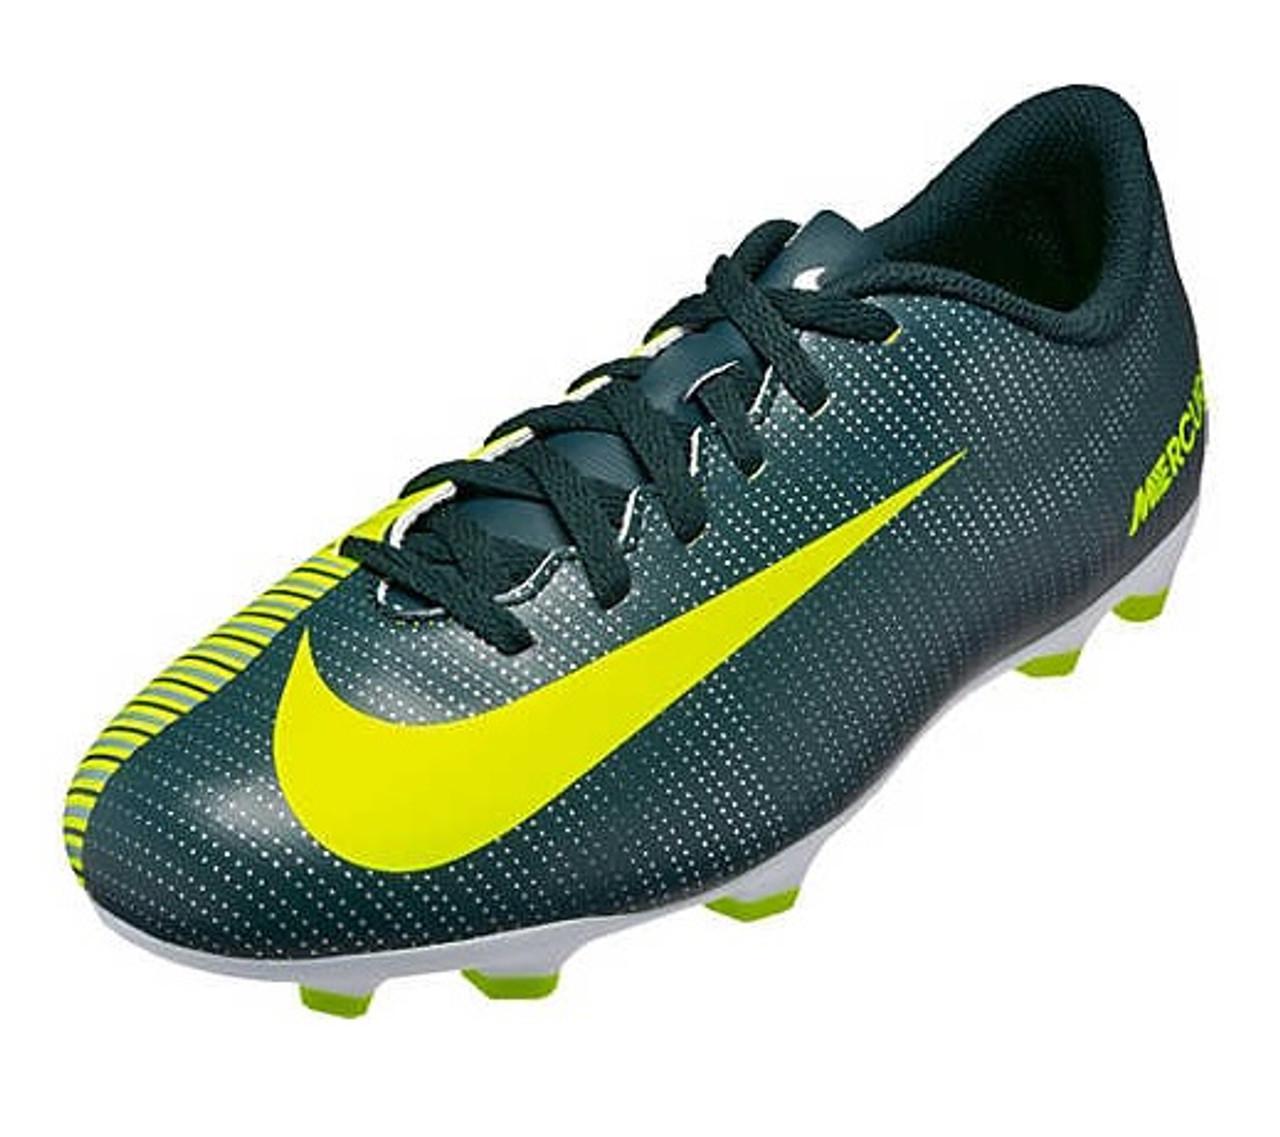 dbad5d18a Nike Jr Mercurial Vortex III CR7 FG - Seaweed Volt Hasta White SD (5718) -  ohp soccer